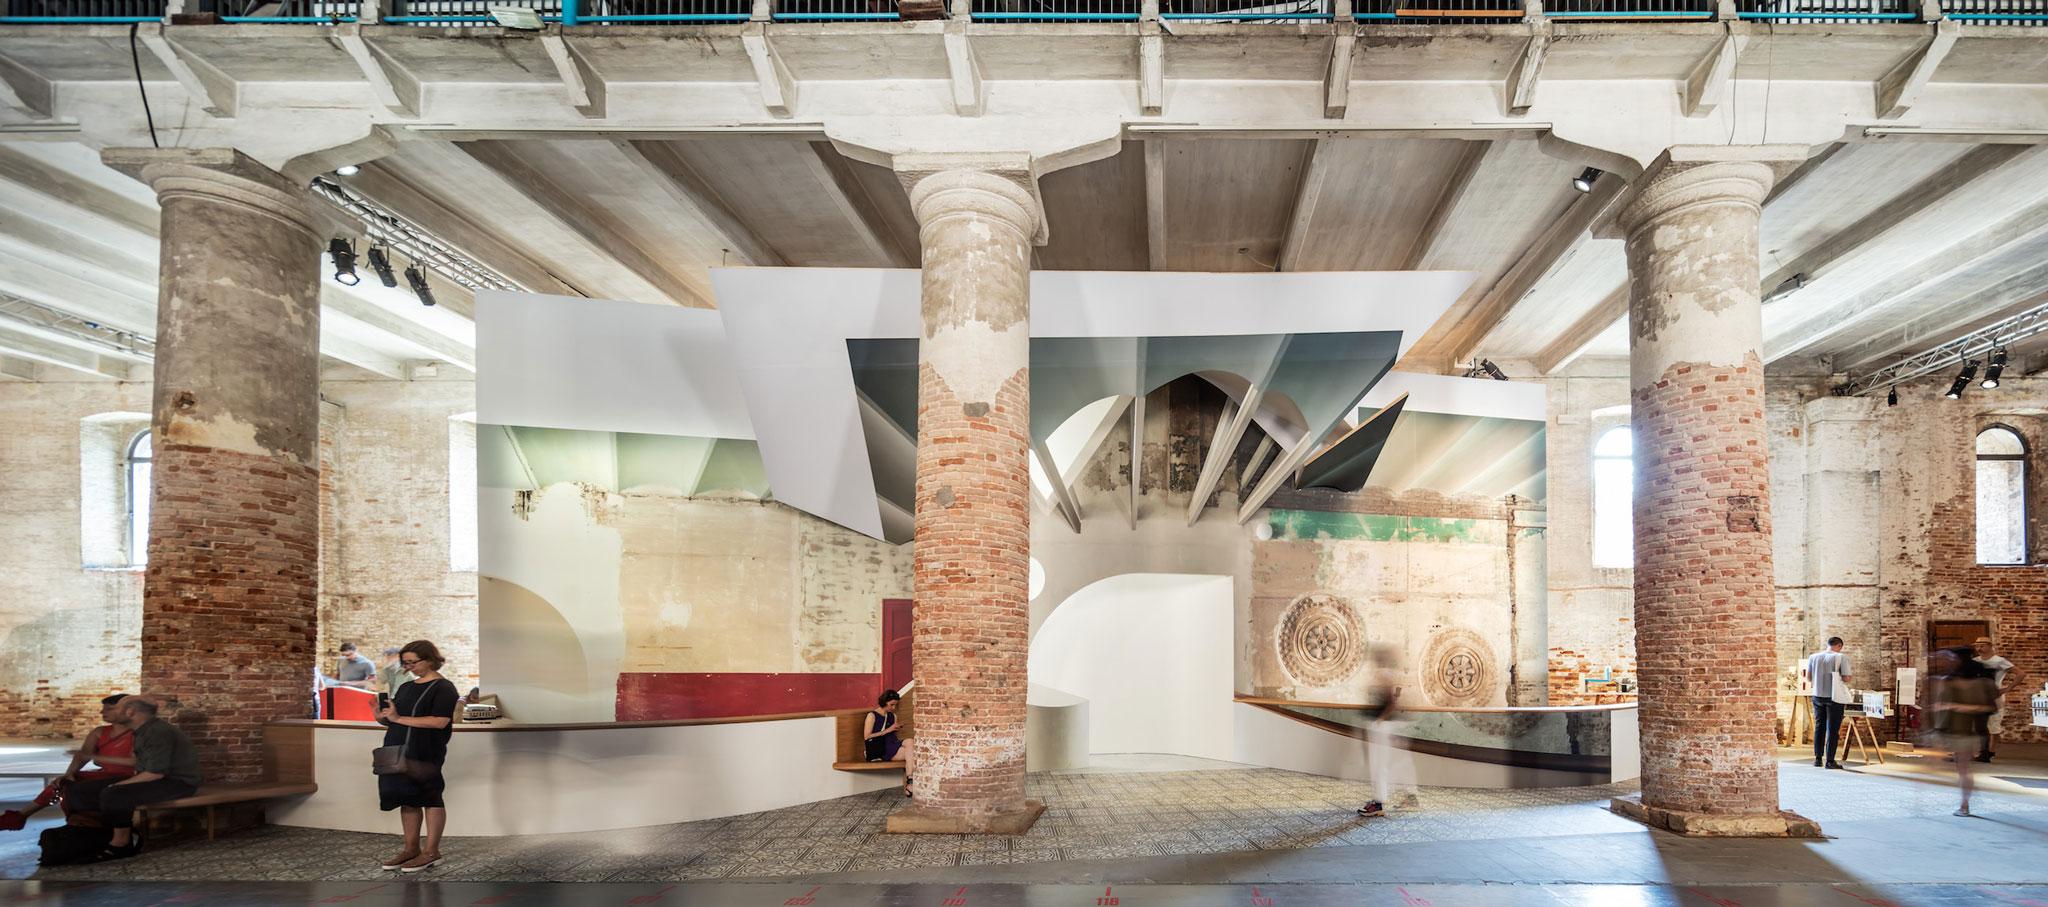 'Liquid Light' de Flores & Prats. 16ª Exposición Internacional de Arquitectura - La Biennale di Venezia, FREESPACE. Fotografía por Adrià Goula Photo